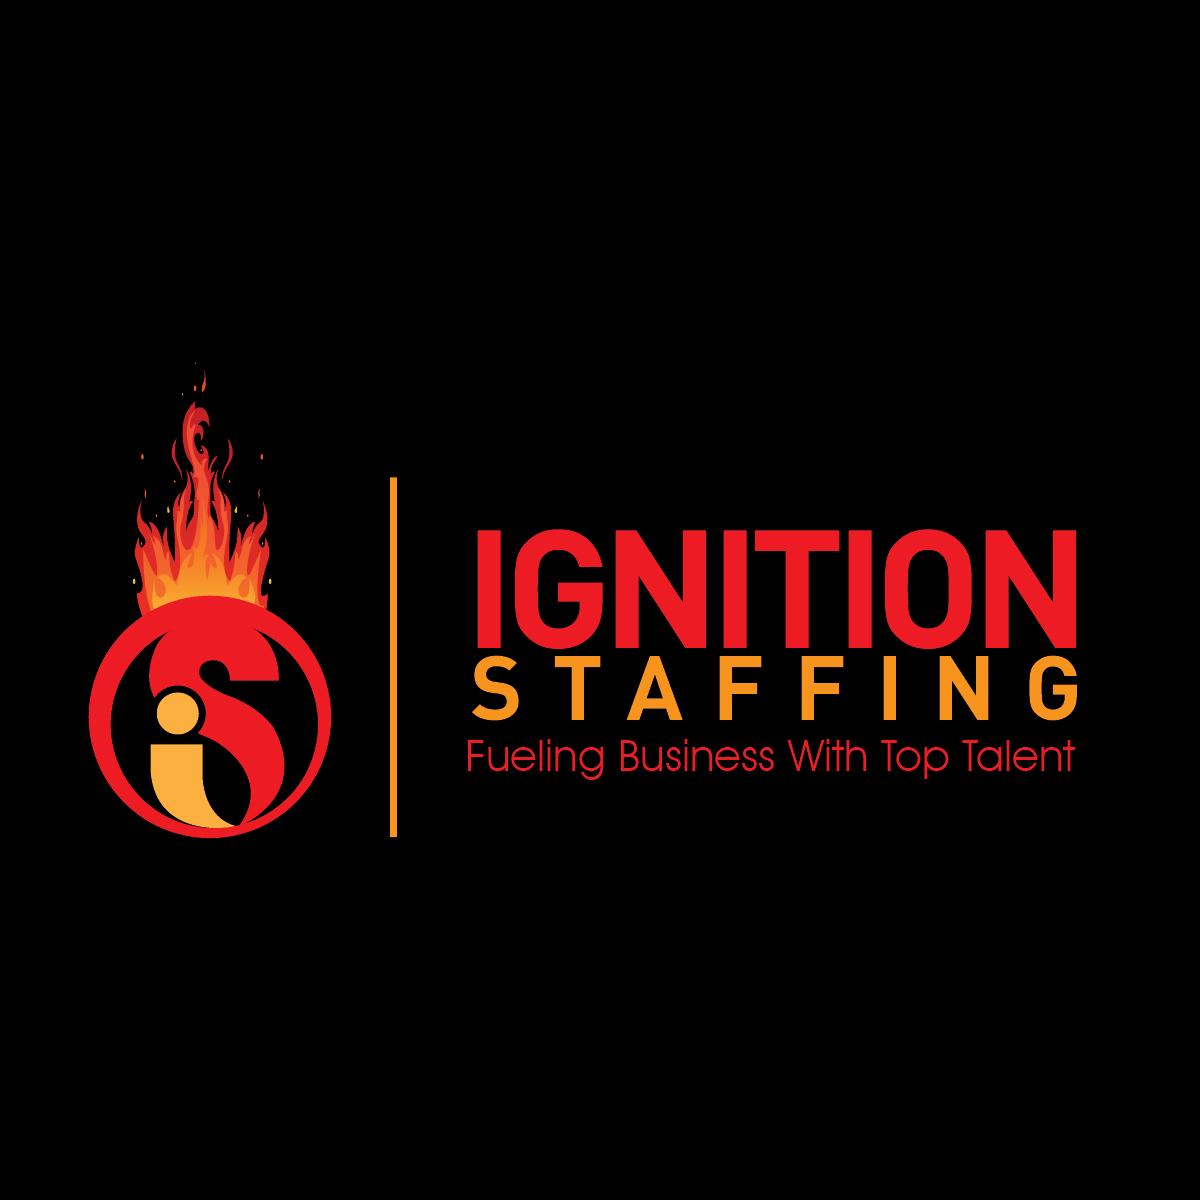 Staffing Company Corporate Recruiting Logo Design